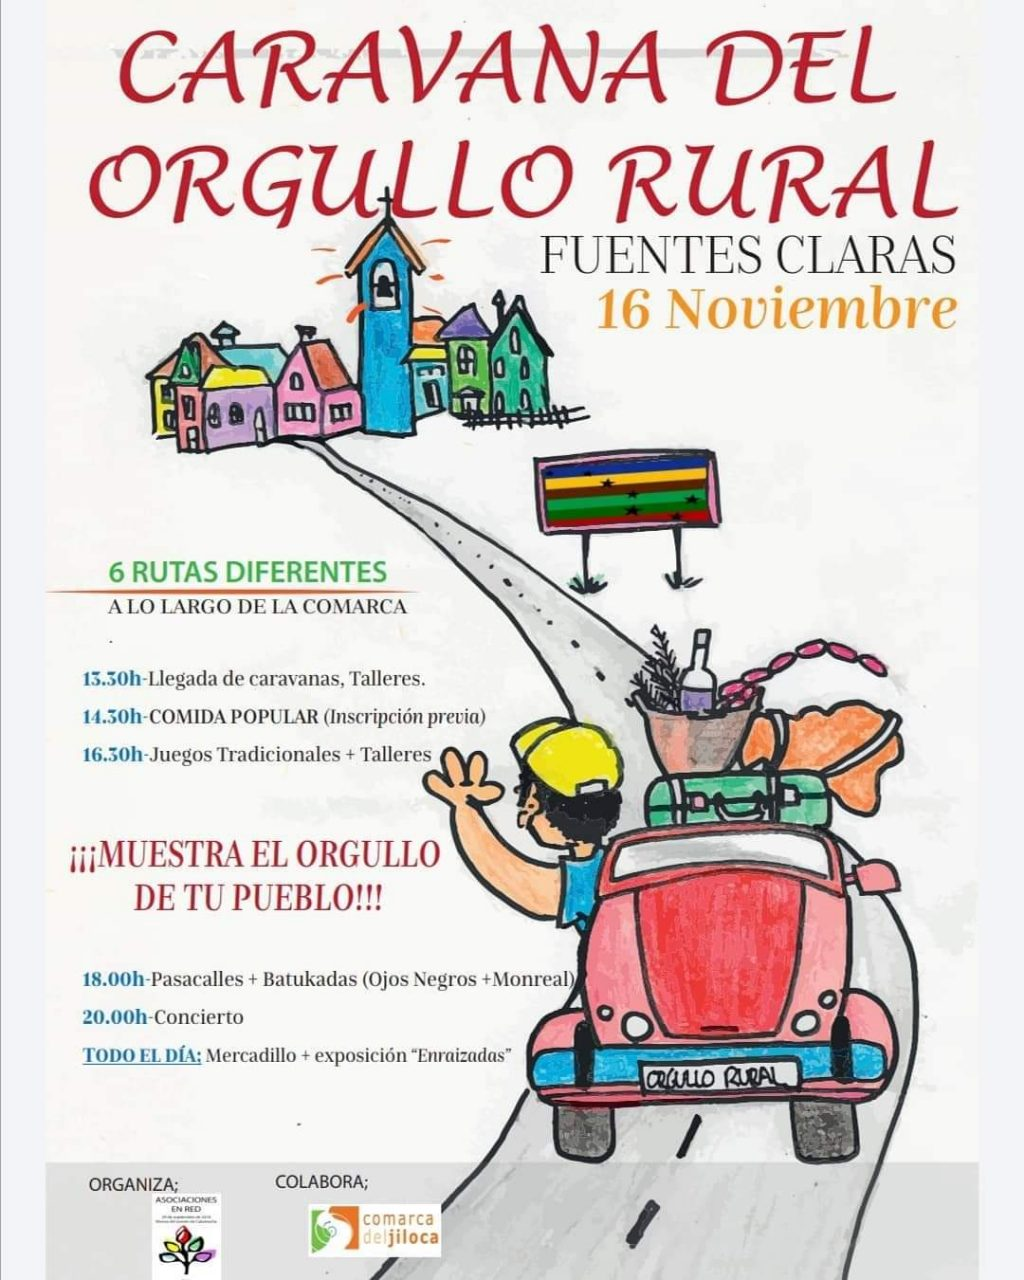 caravana orgullo rural fuentes claras 2019